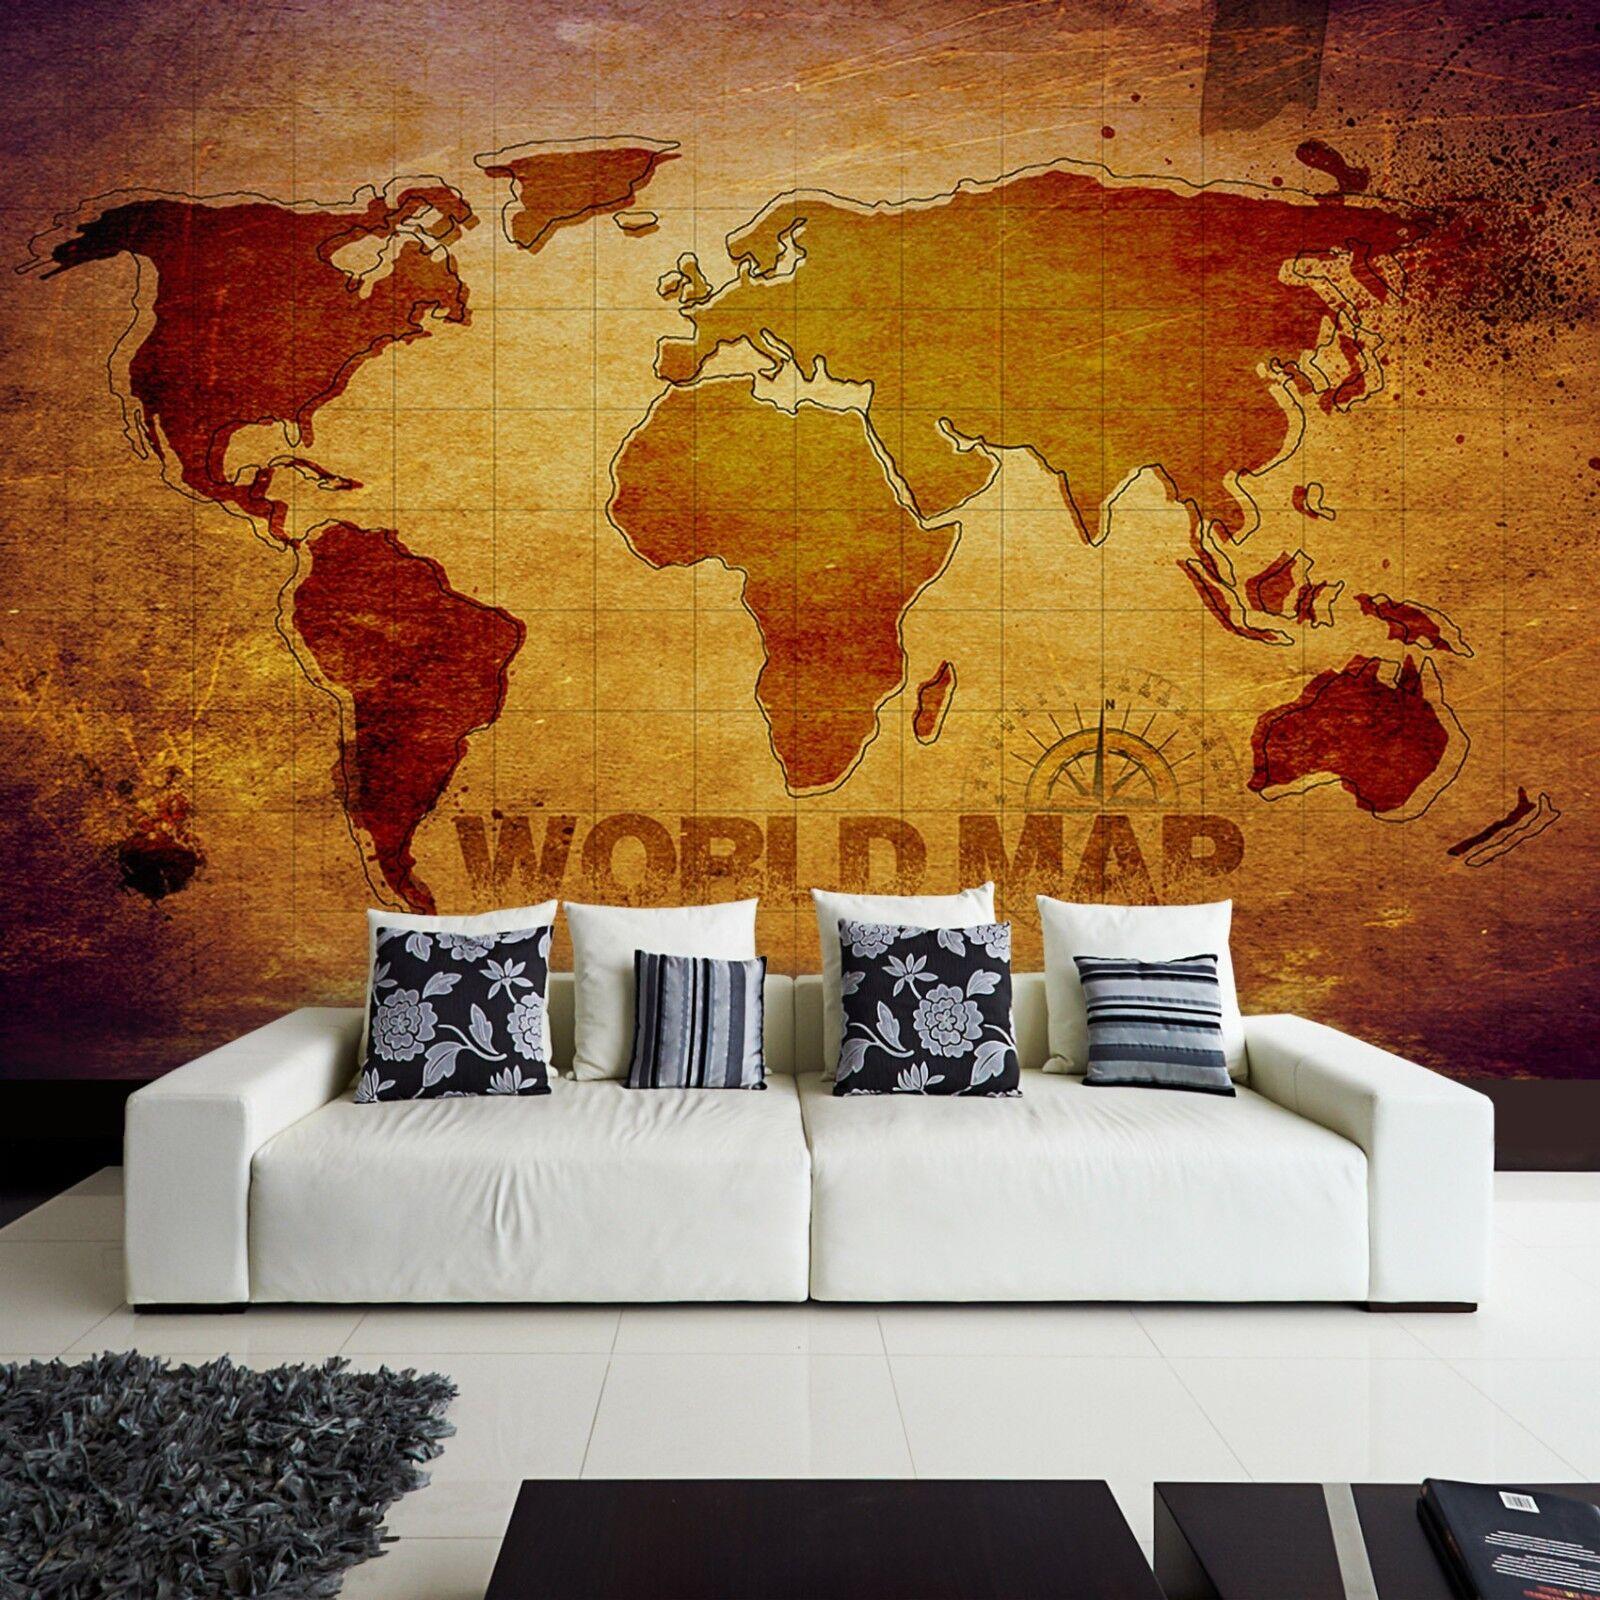 Tapete Vlies Fototapete modernes Design Weltkarte Landkarte Atlas world map